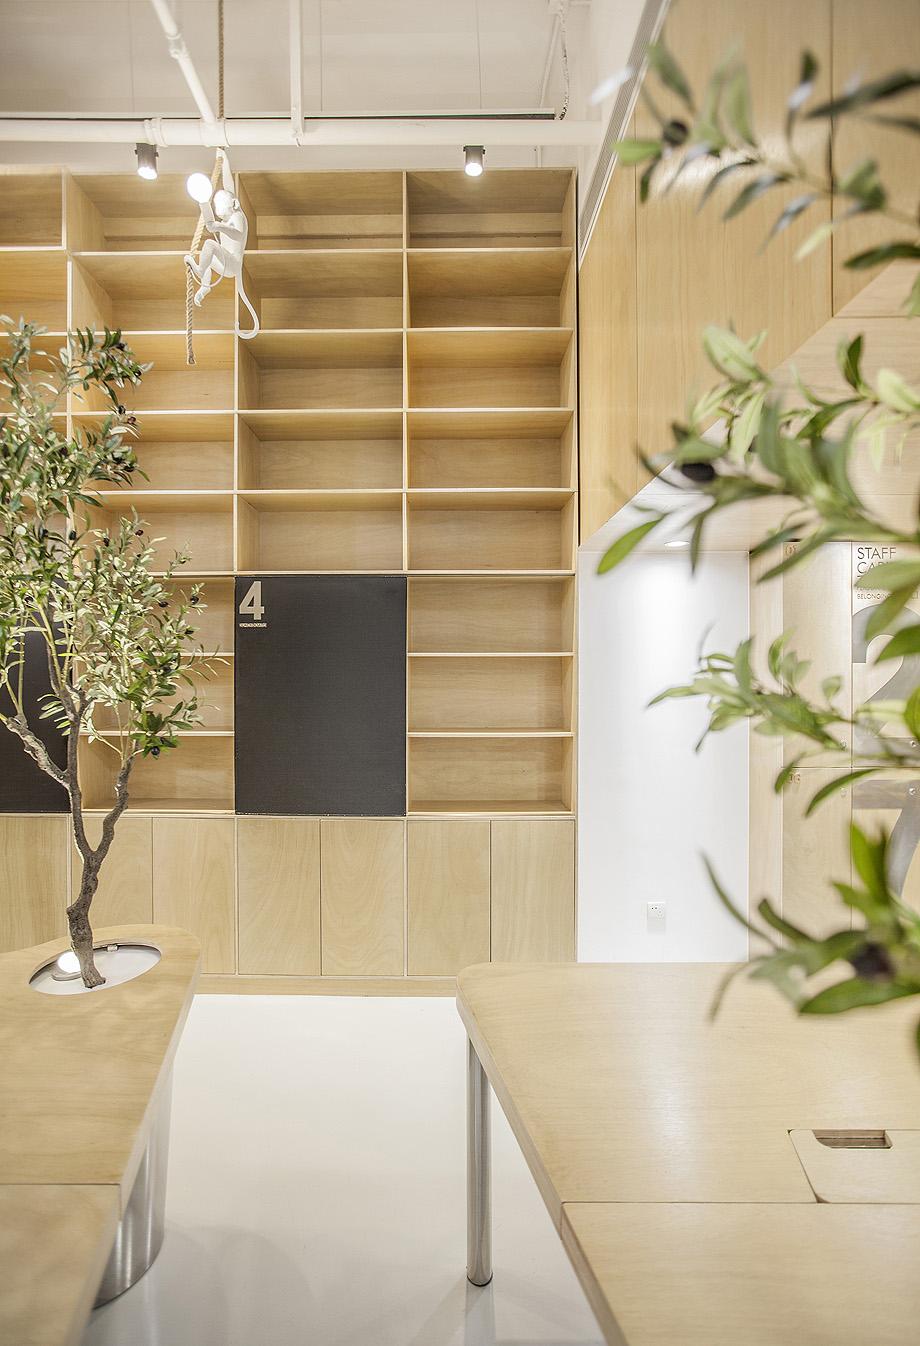 oficina con plantas de towodesign - foto towodesign (22)